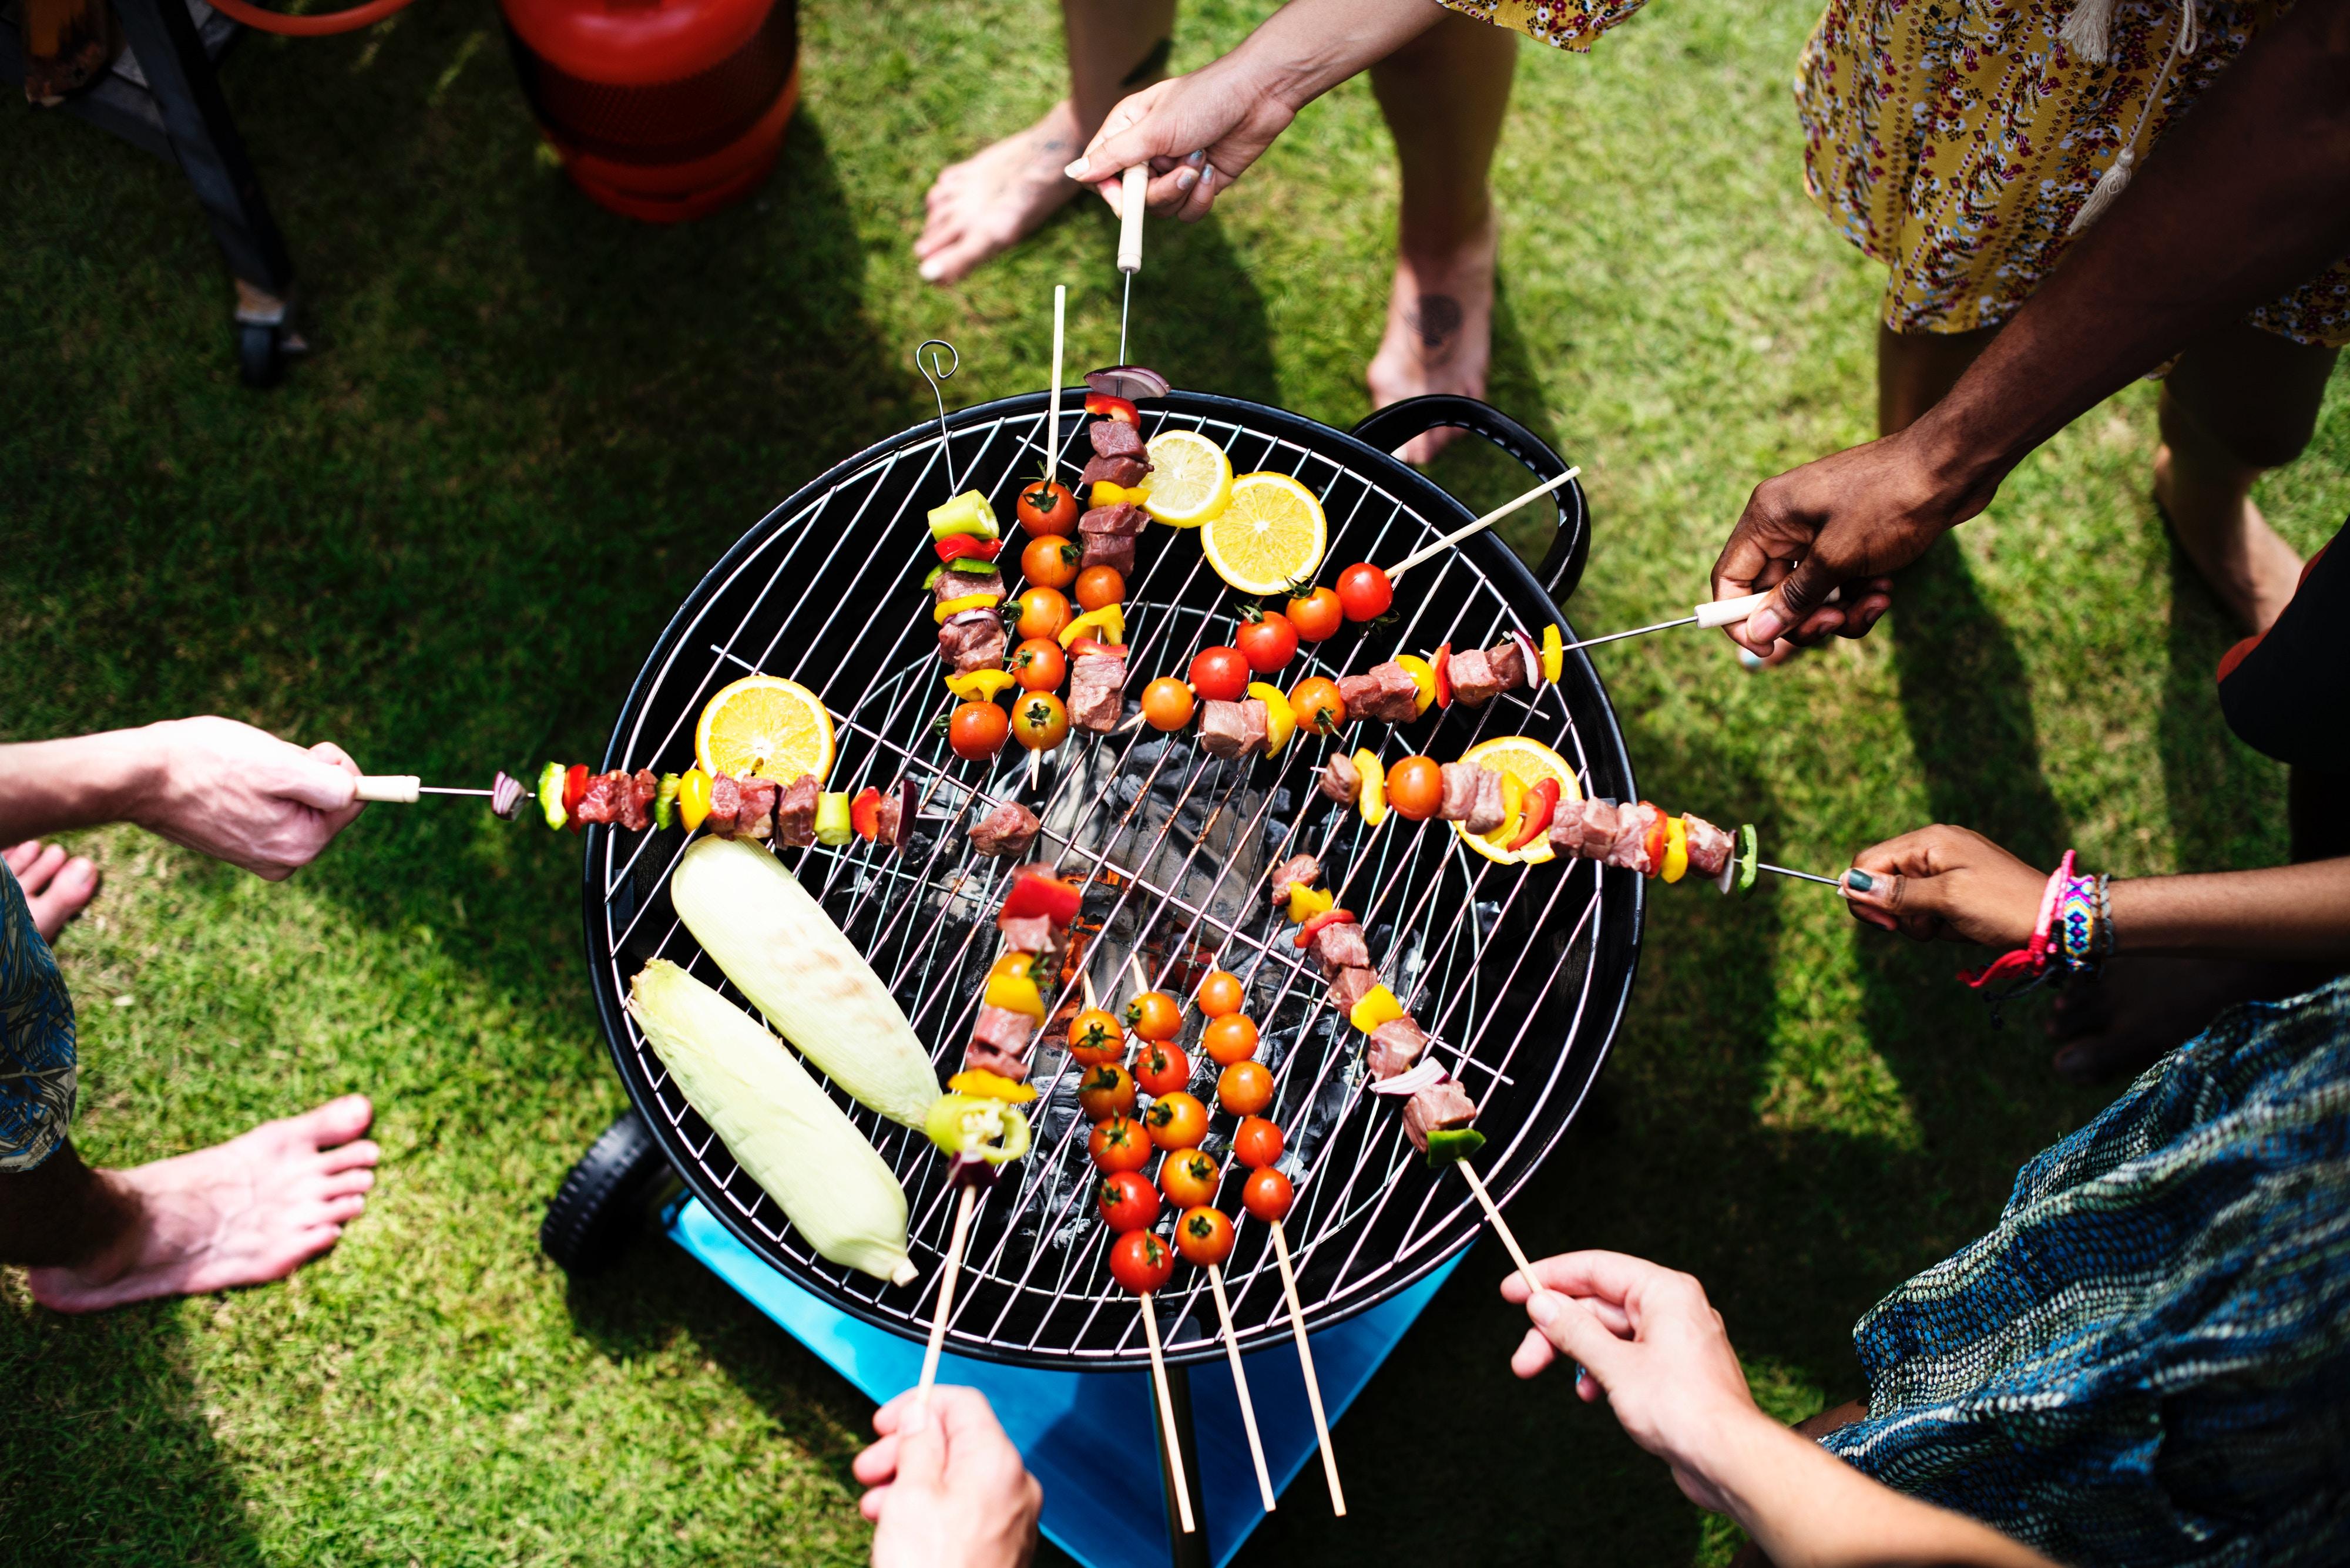 Cultural events - cookout